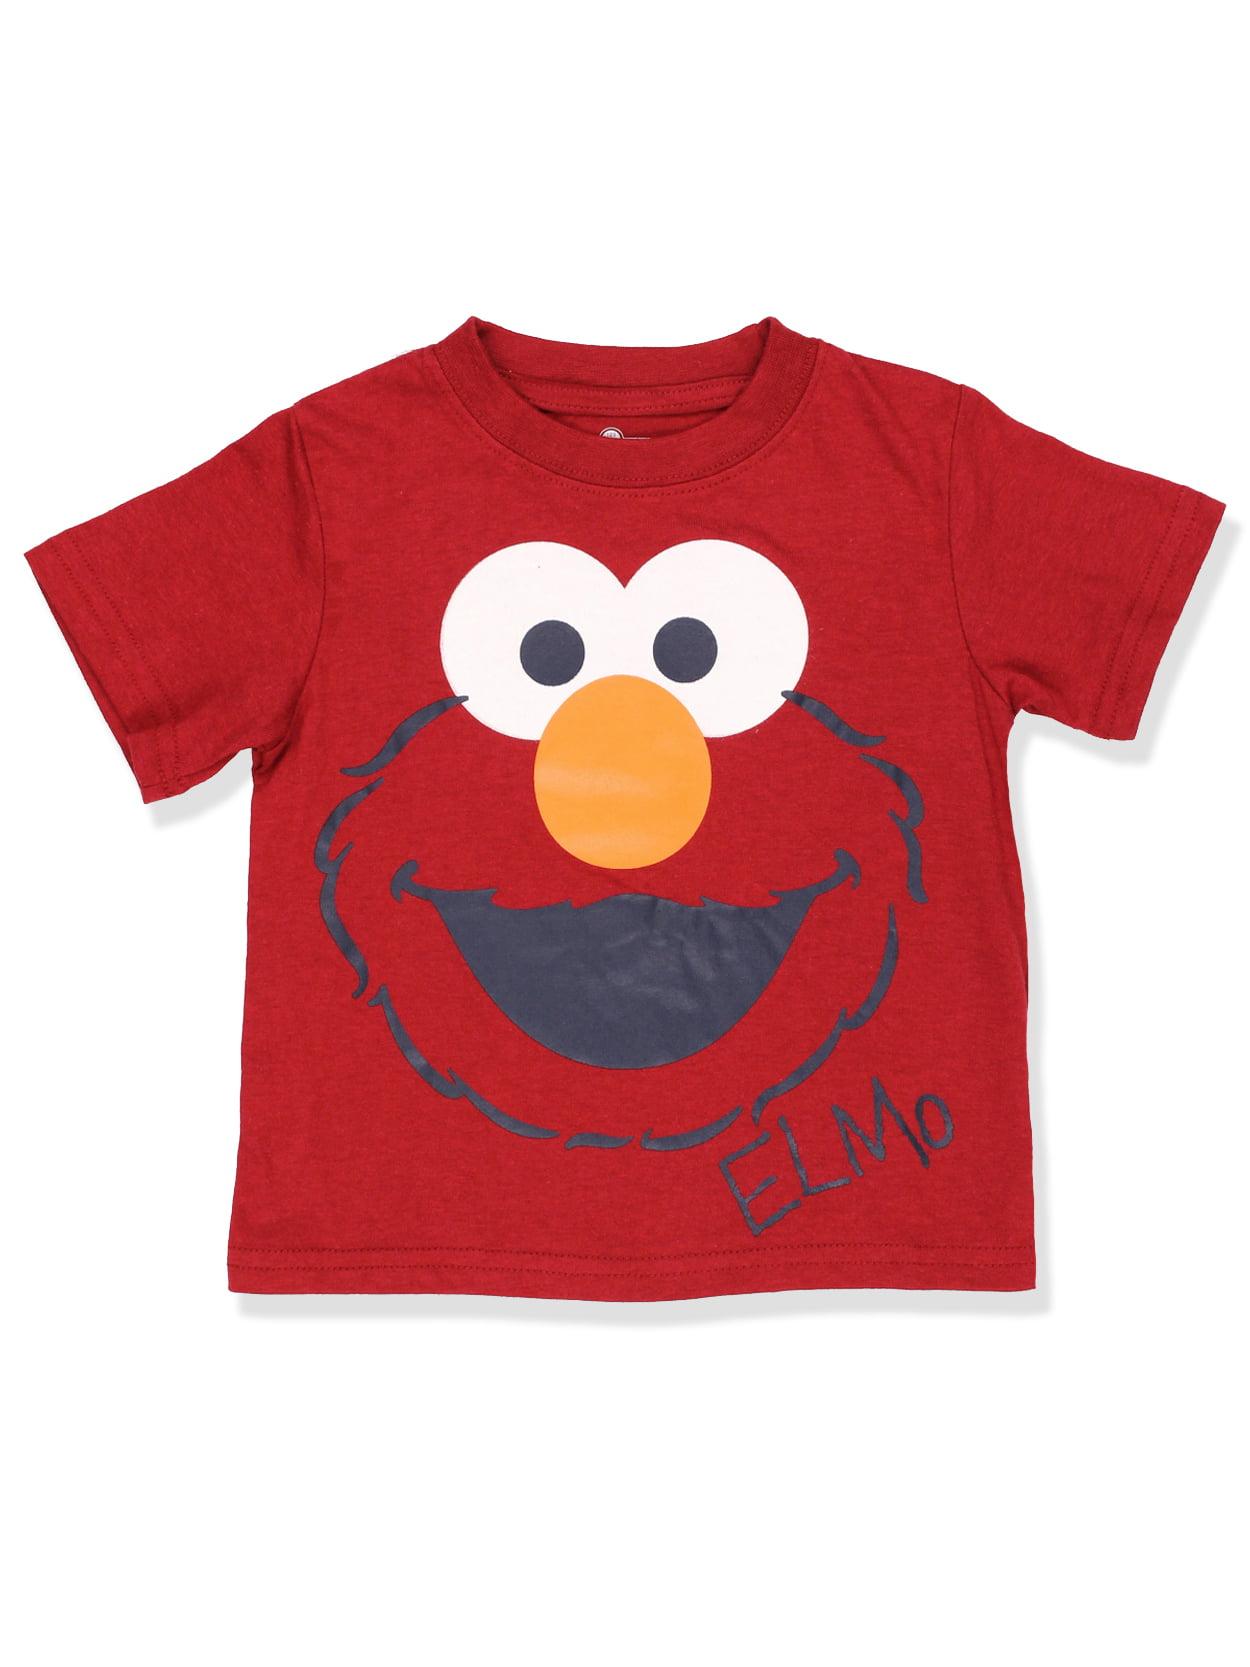 Sesame Street Elmo Boys Short Sleeve Tee (Baby/Toddler) 6SE4718